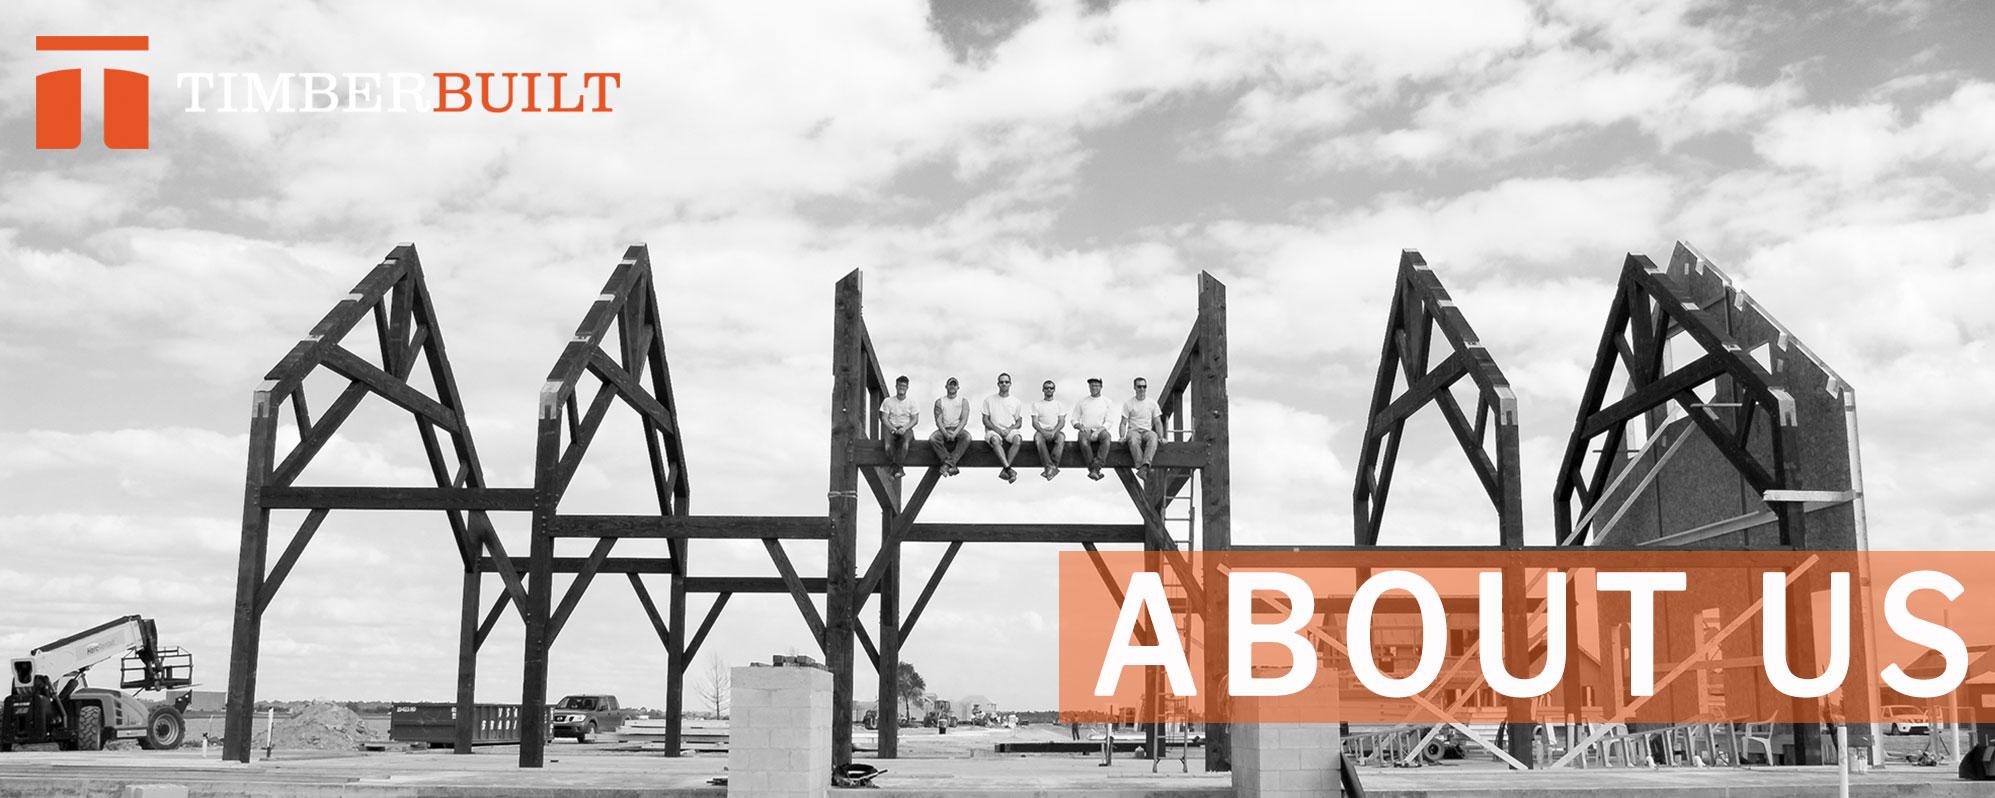 Timber Frame Designers & Builders | Our Team | Timberbuilt